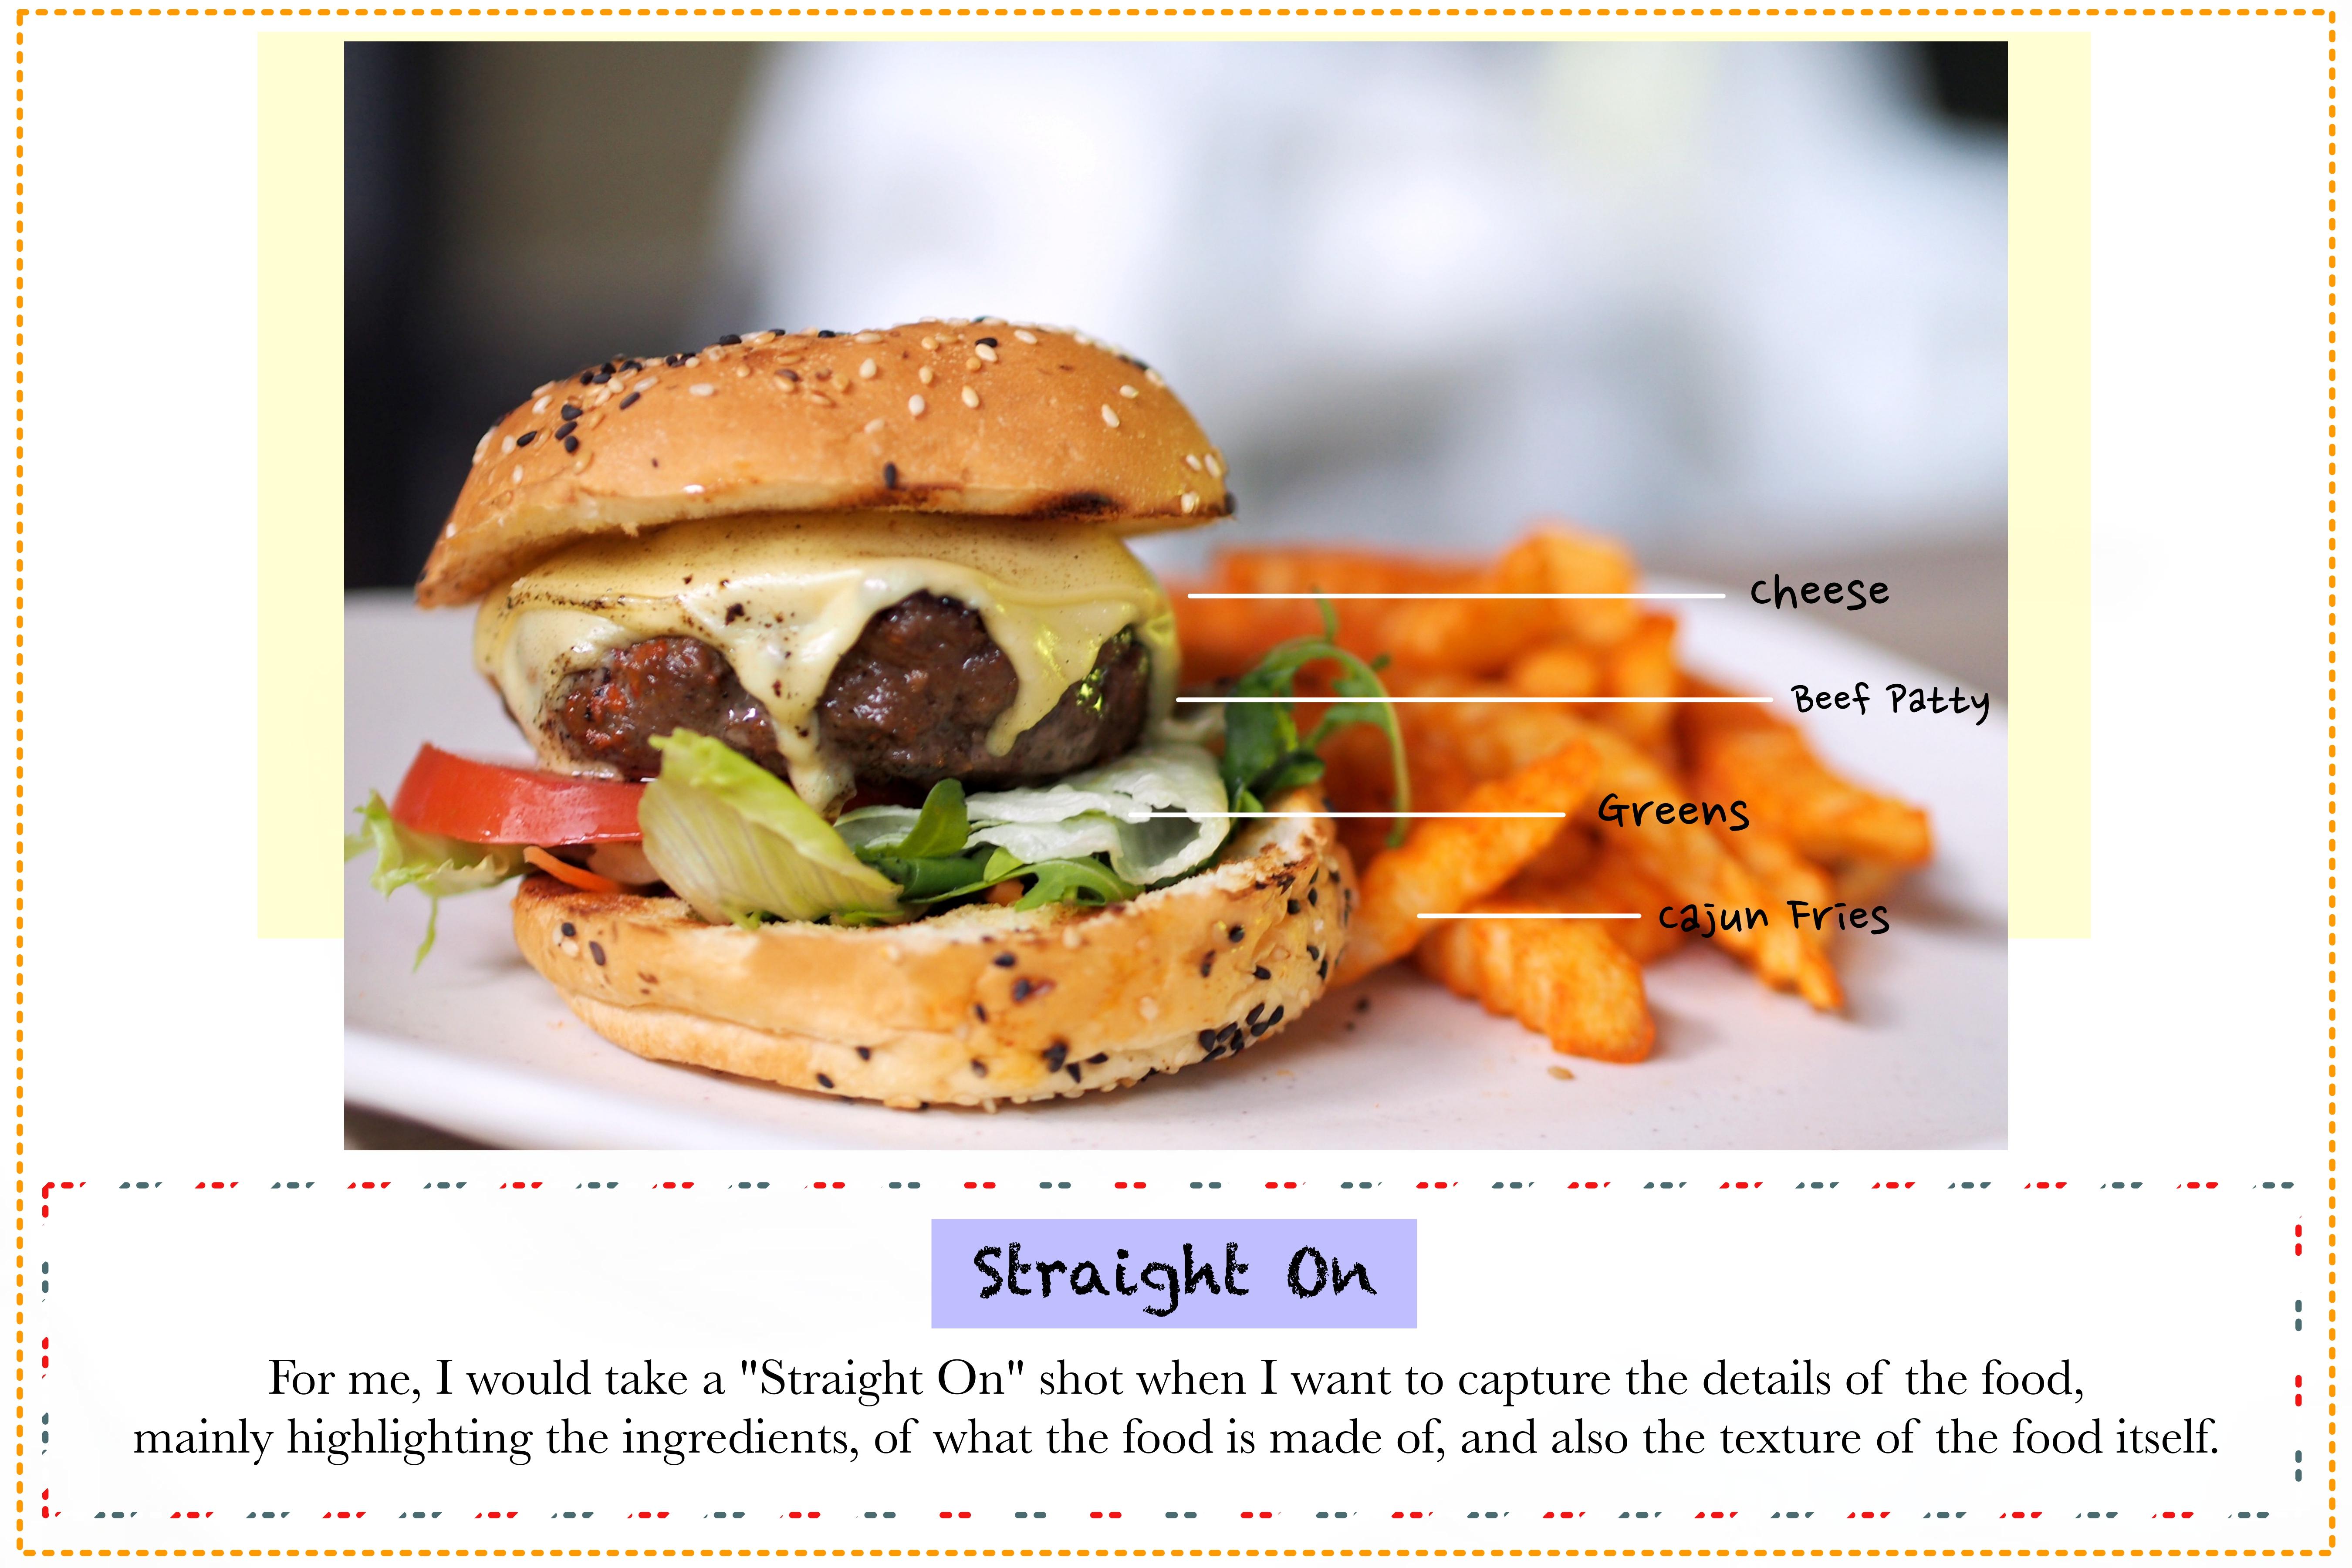 food photography 1.1